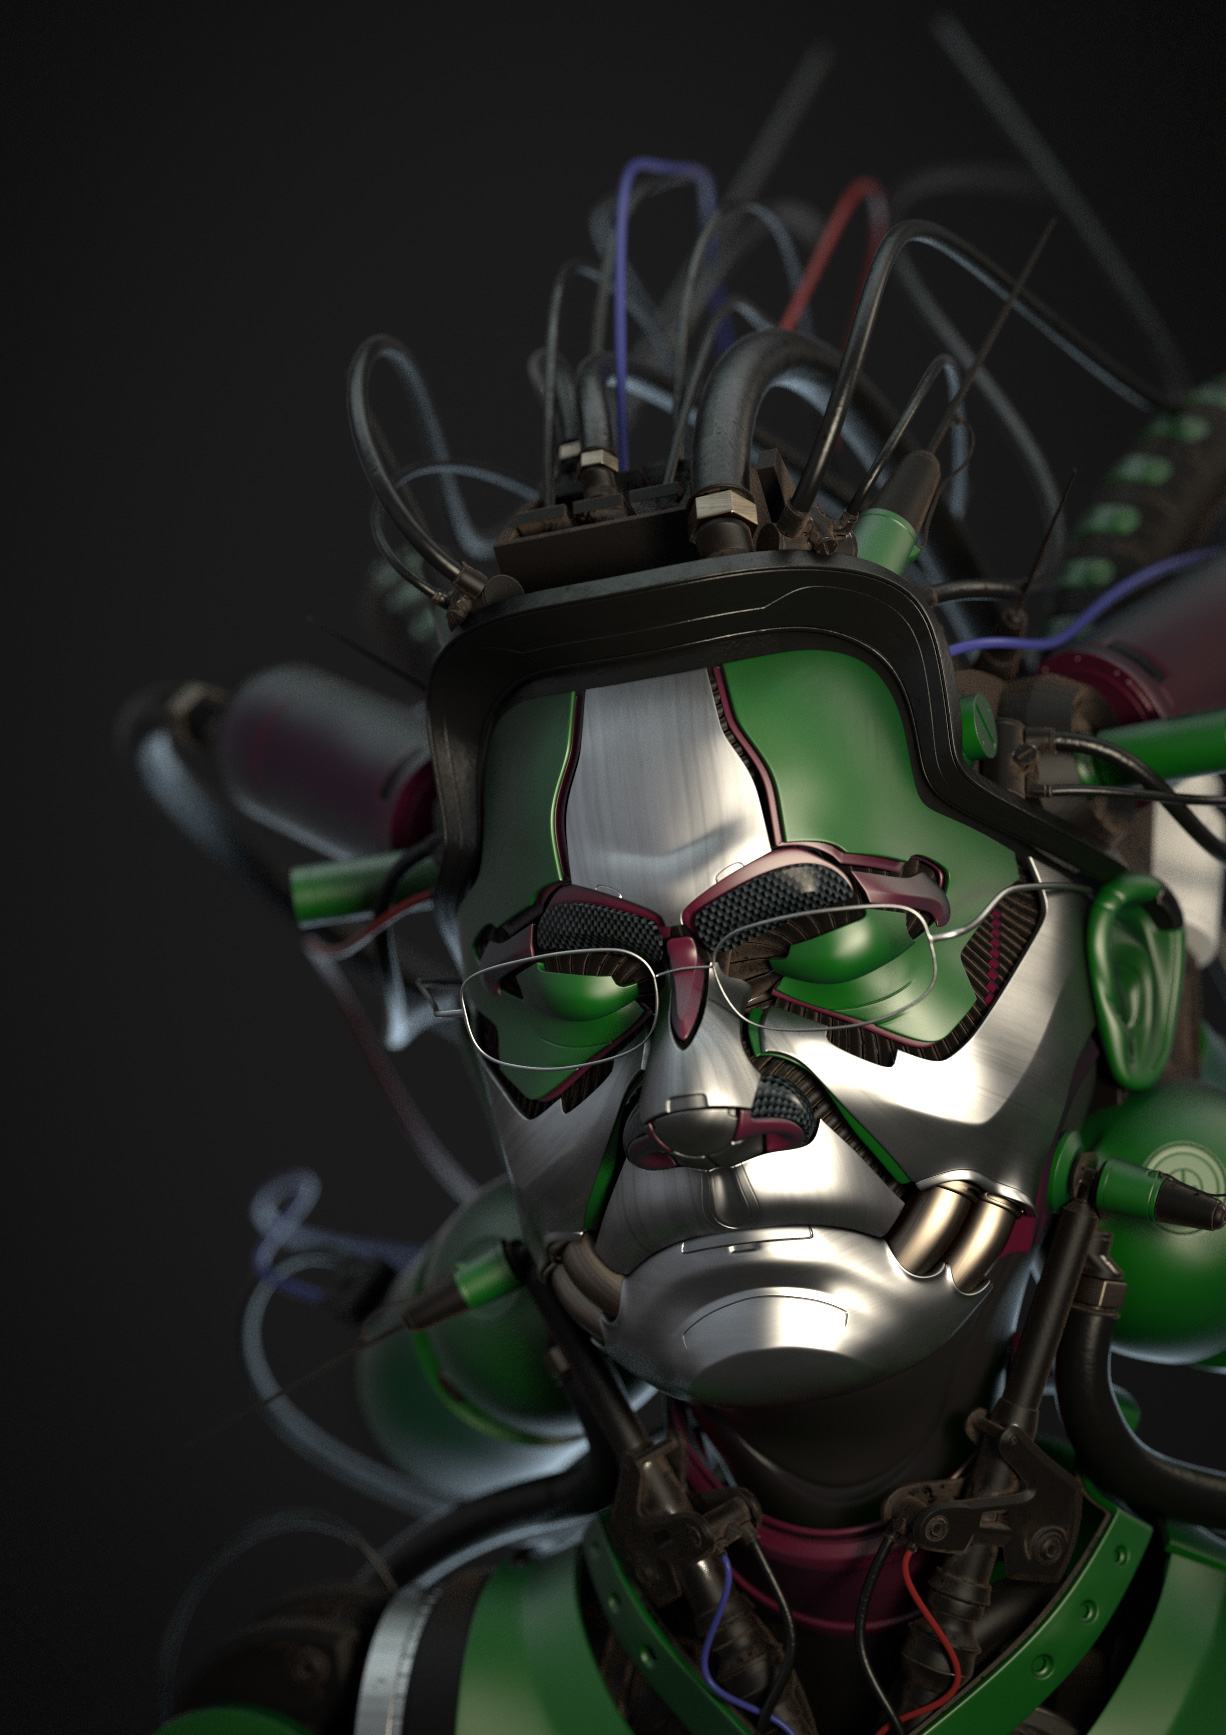 Monkibase cyborg jhh t4i 1 36dae7fc 537z